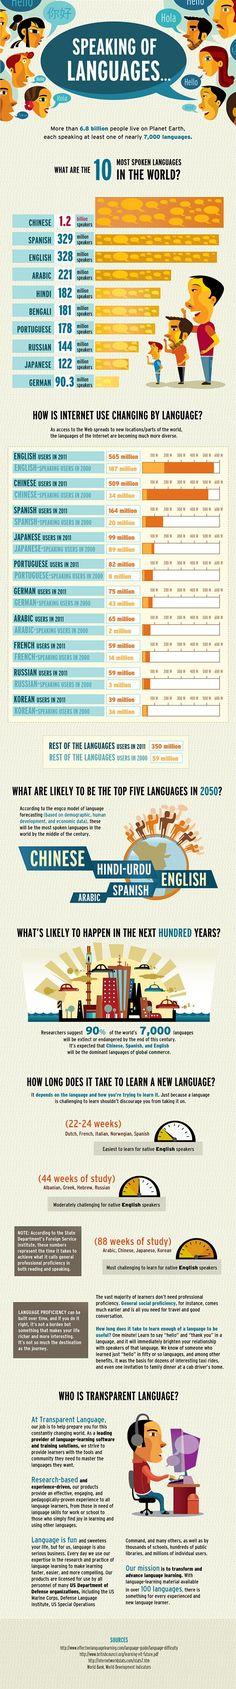 infographic-speaking-of-languages